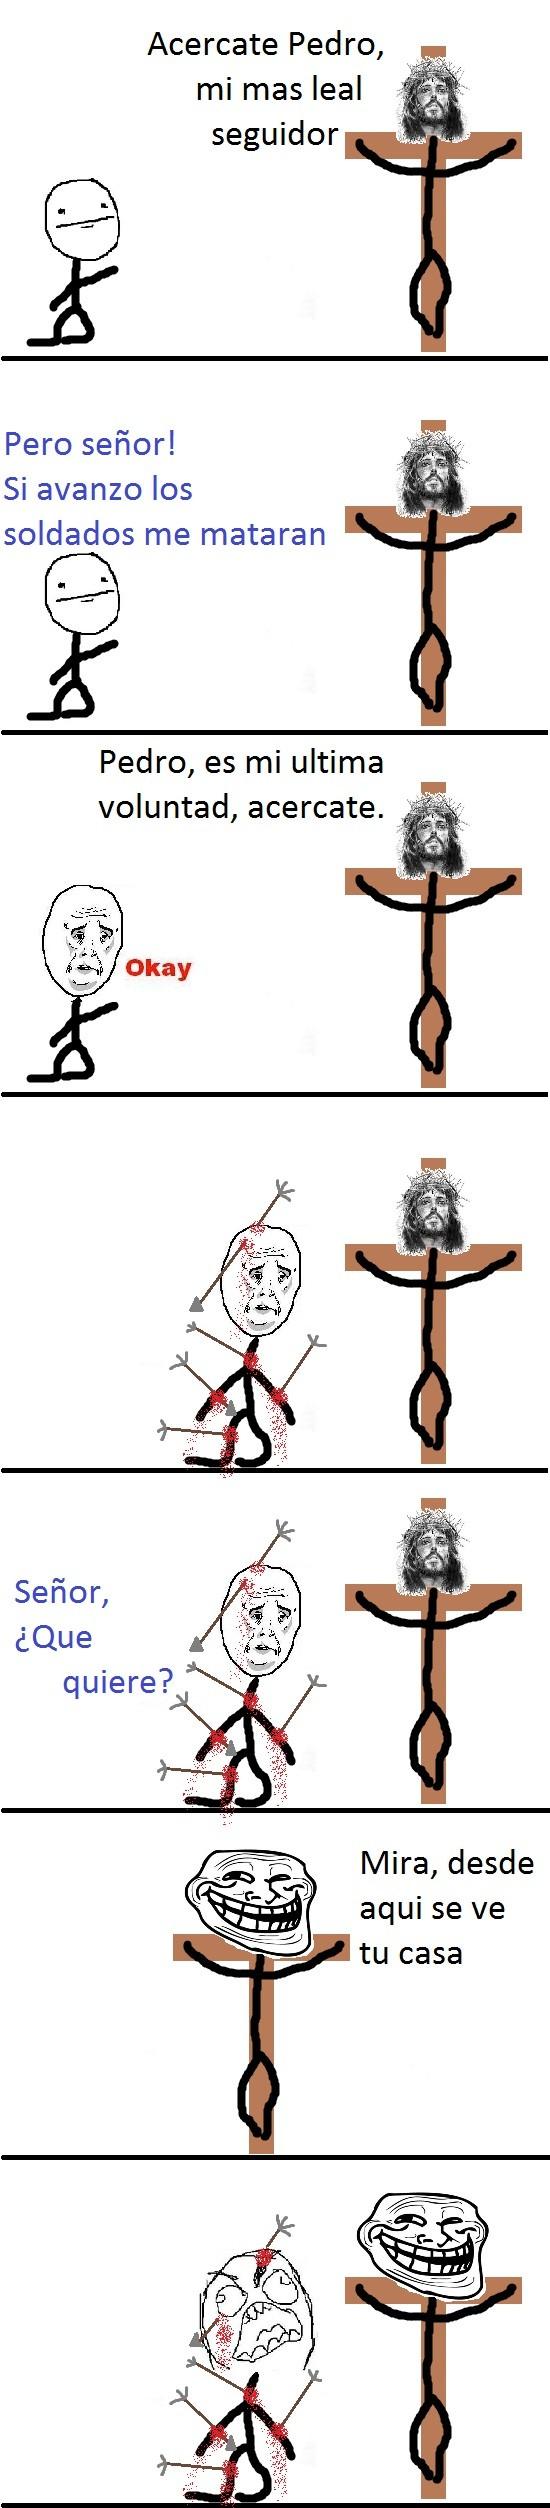 Trollface - Jesucristo